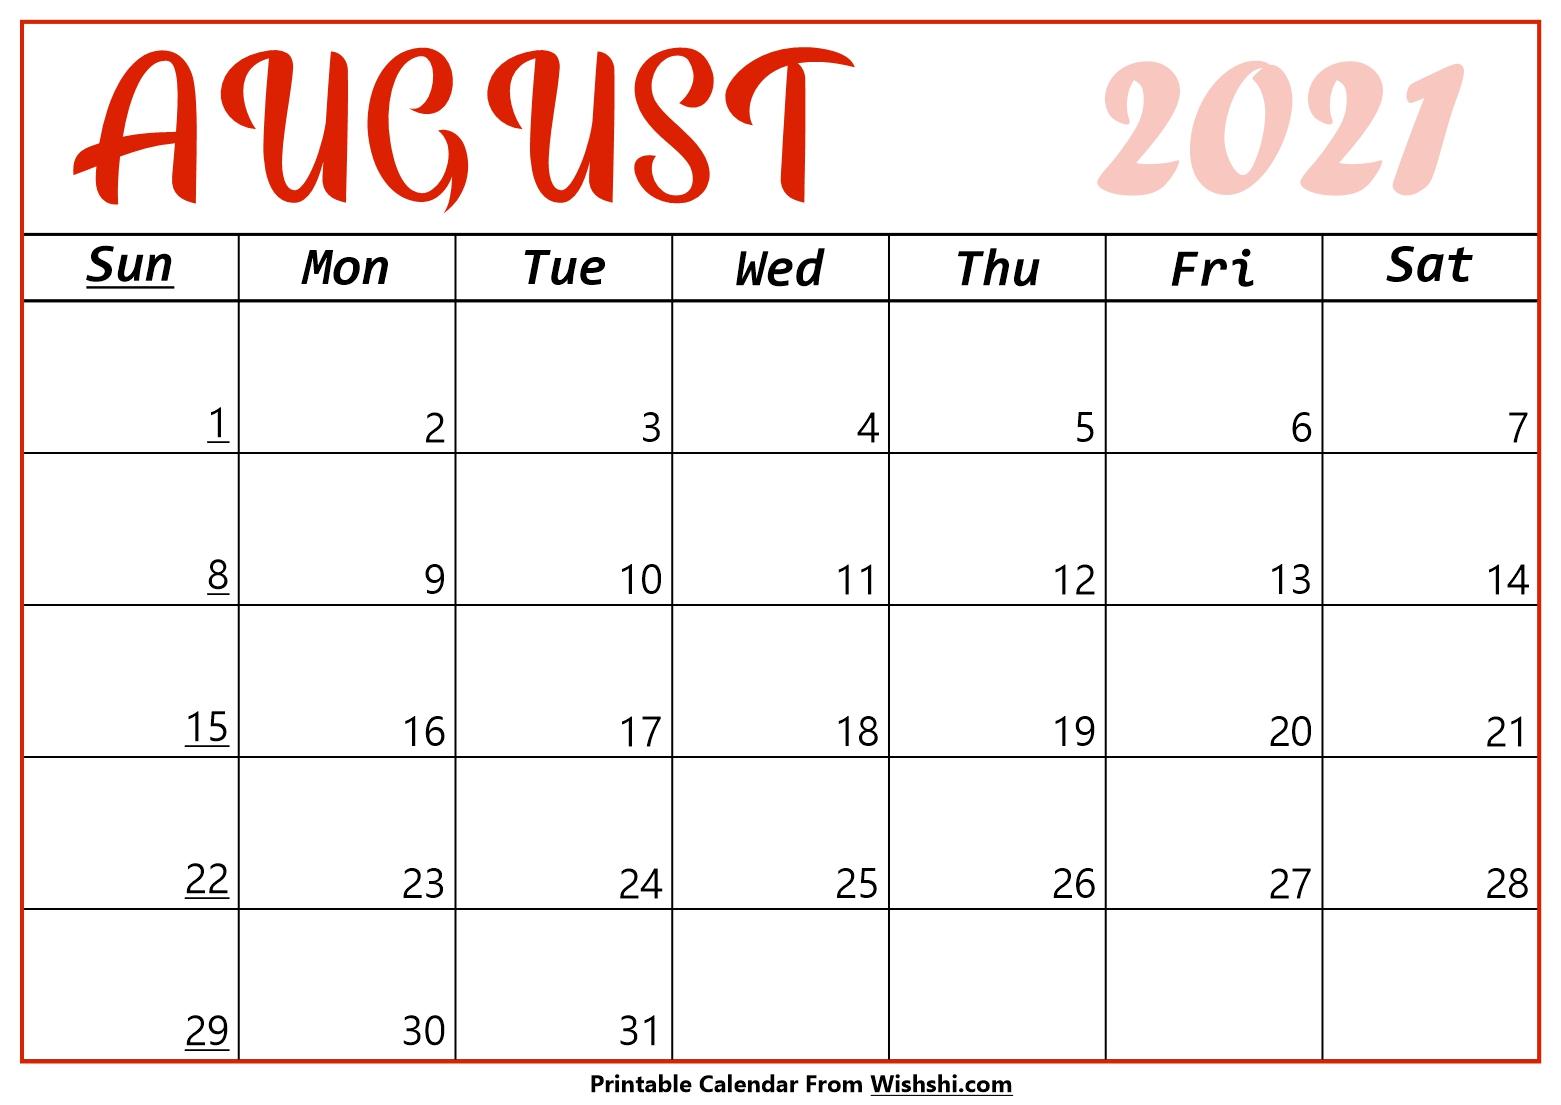 August 2021 Calendar Printable  Free Printable Calendars with August 2021 Calendar Print